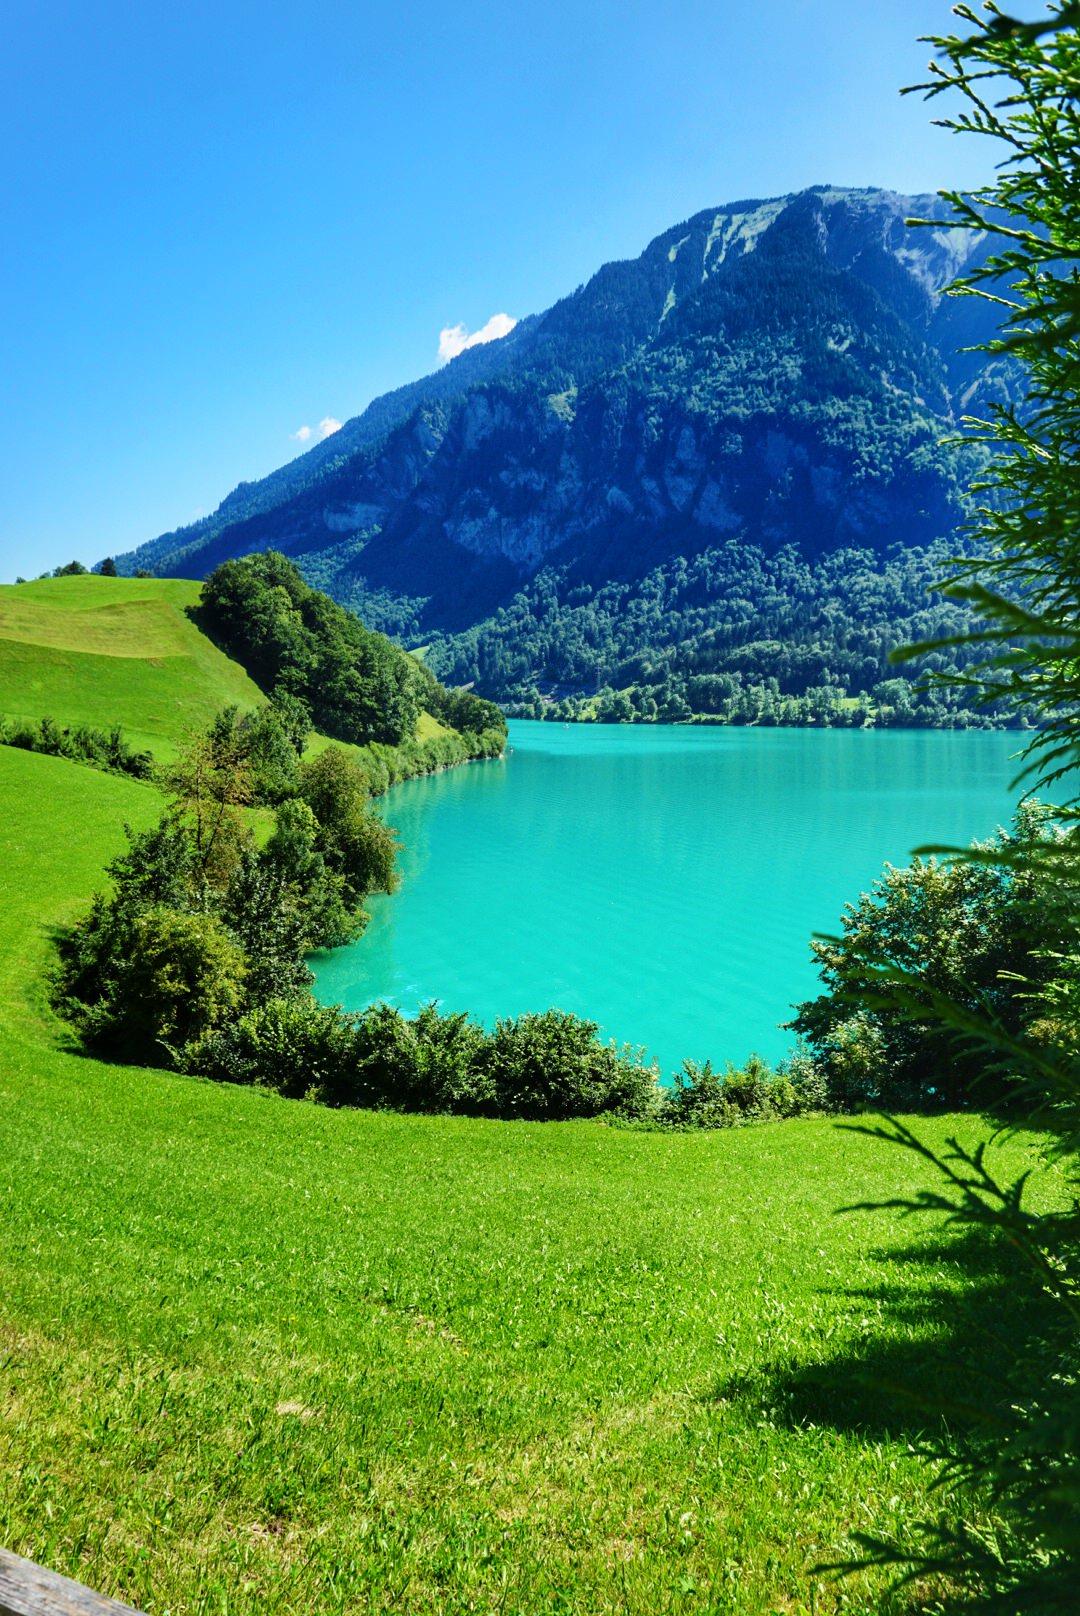 Less crowded lakeisde hike on Lake Lungern Switzerland